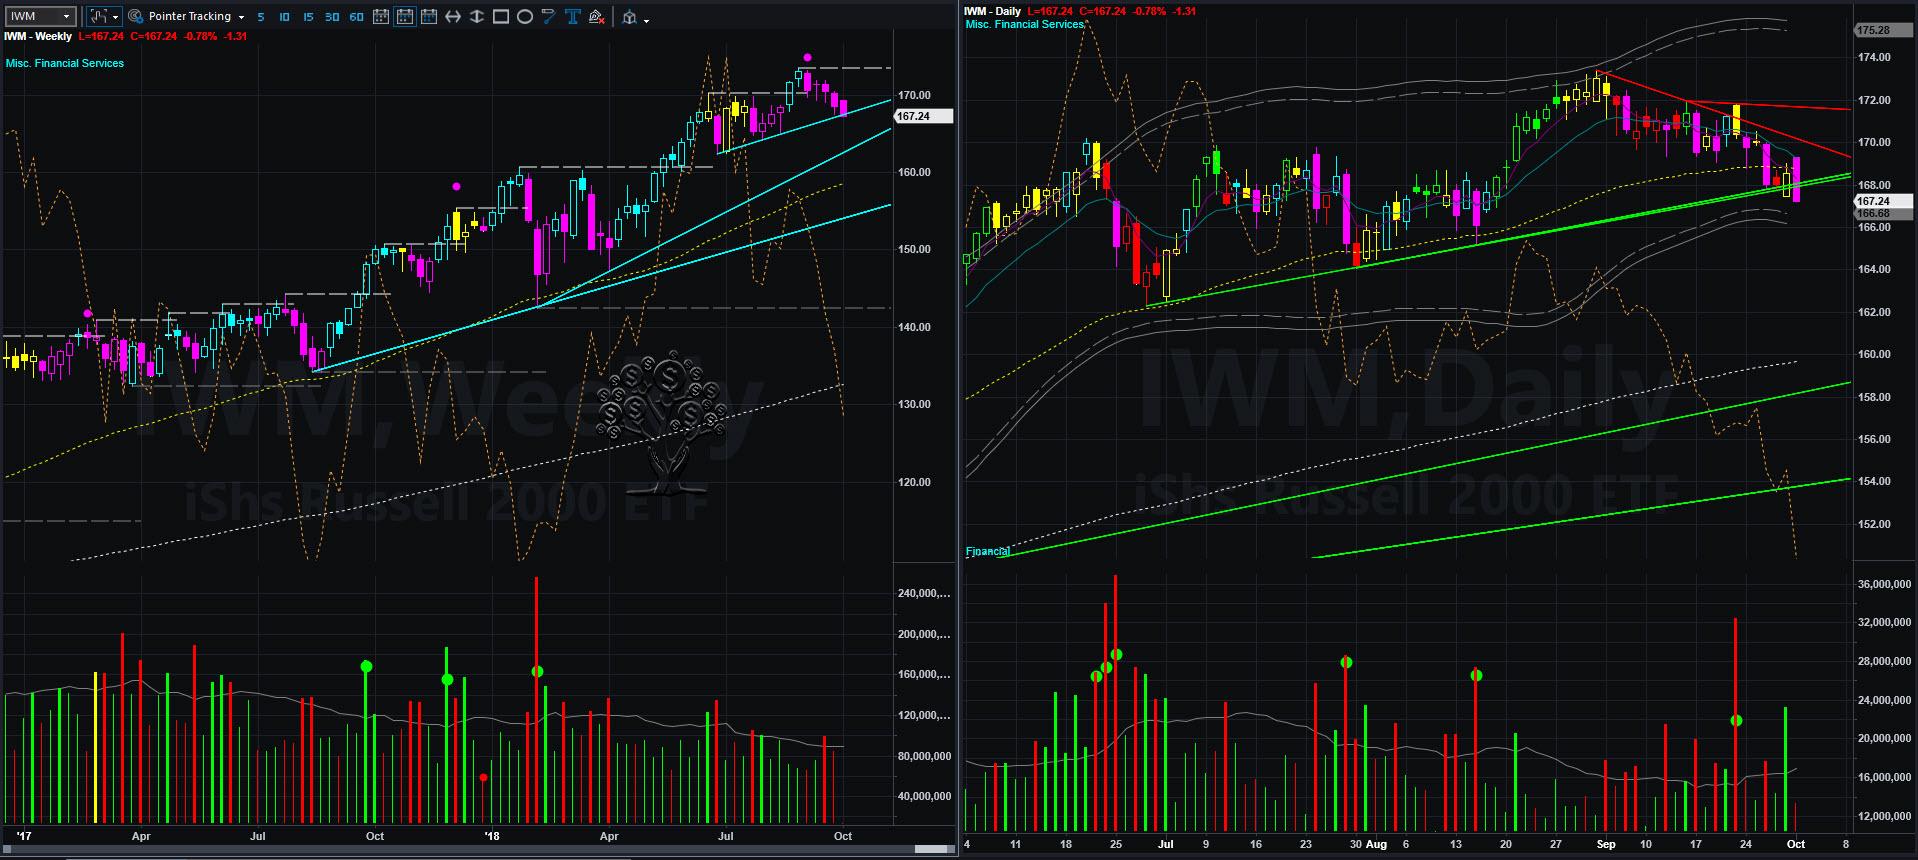 IWM chart 2018-10-01_12-42-14.jpg